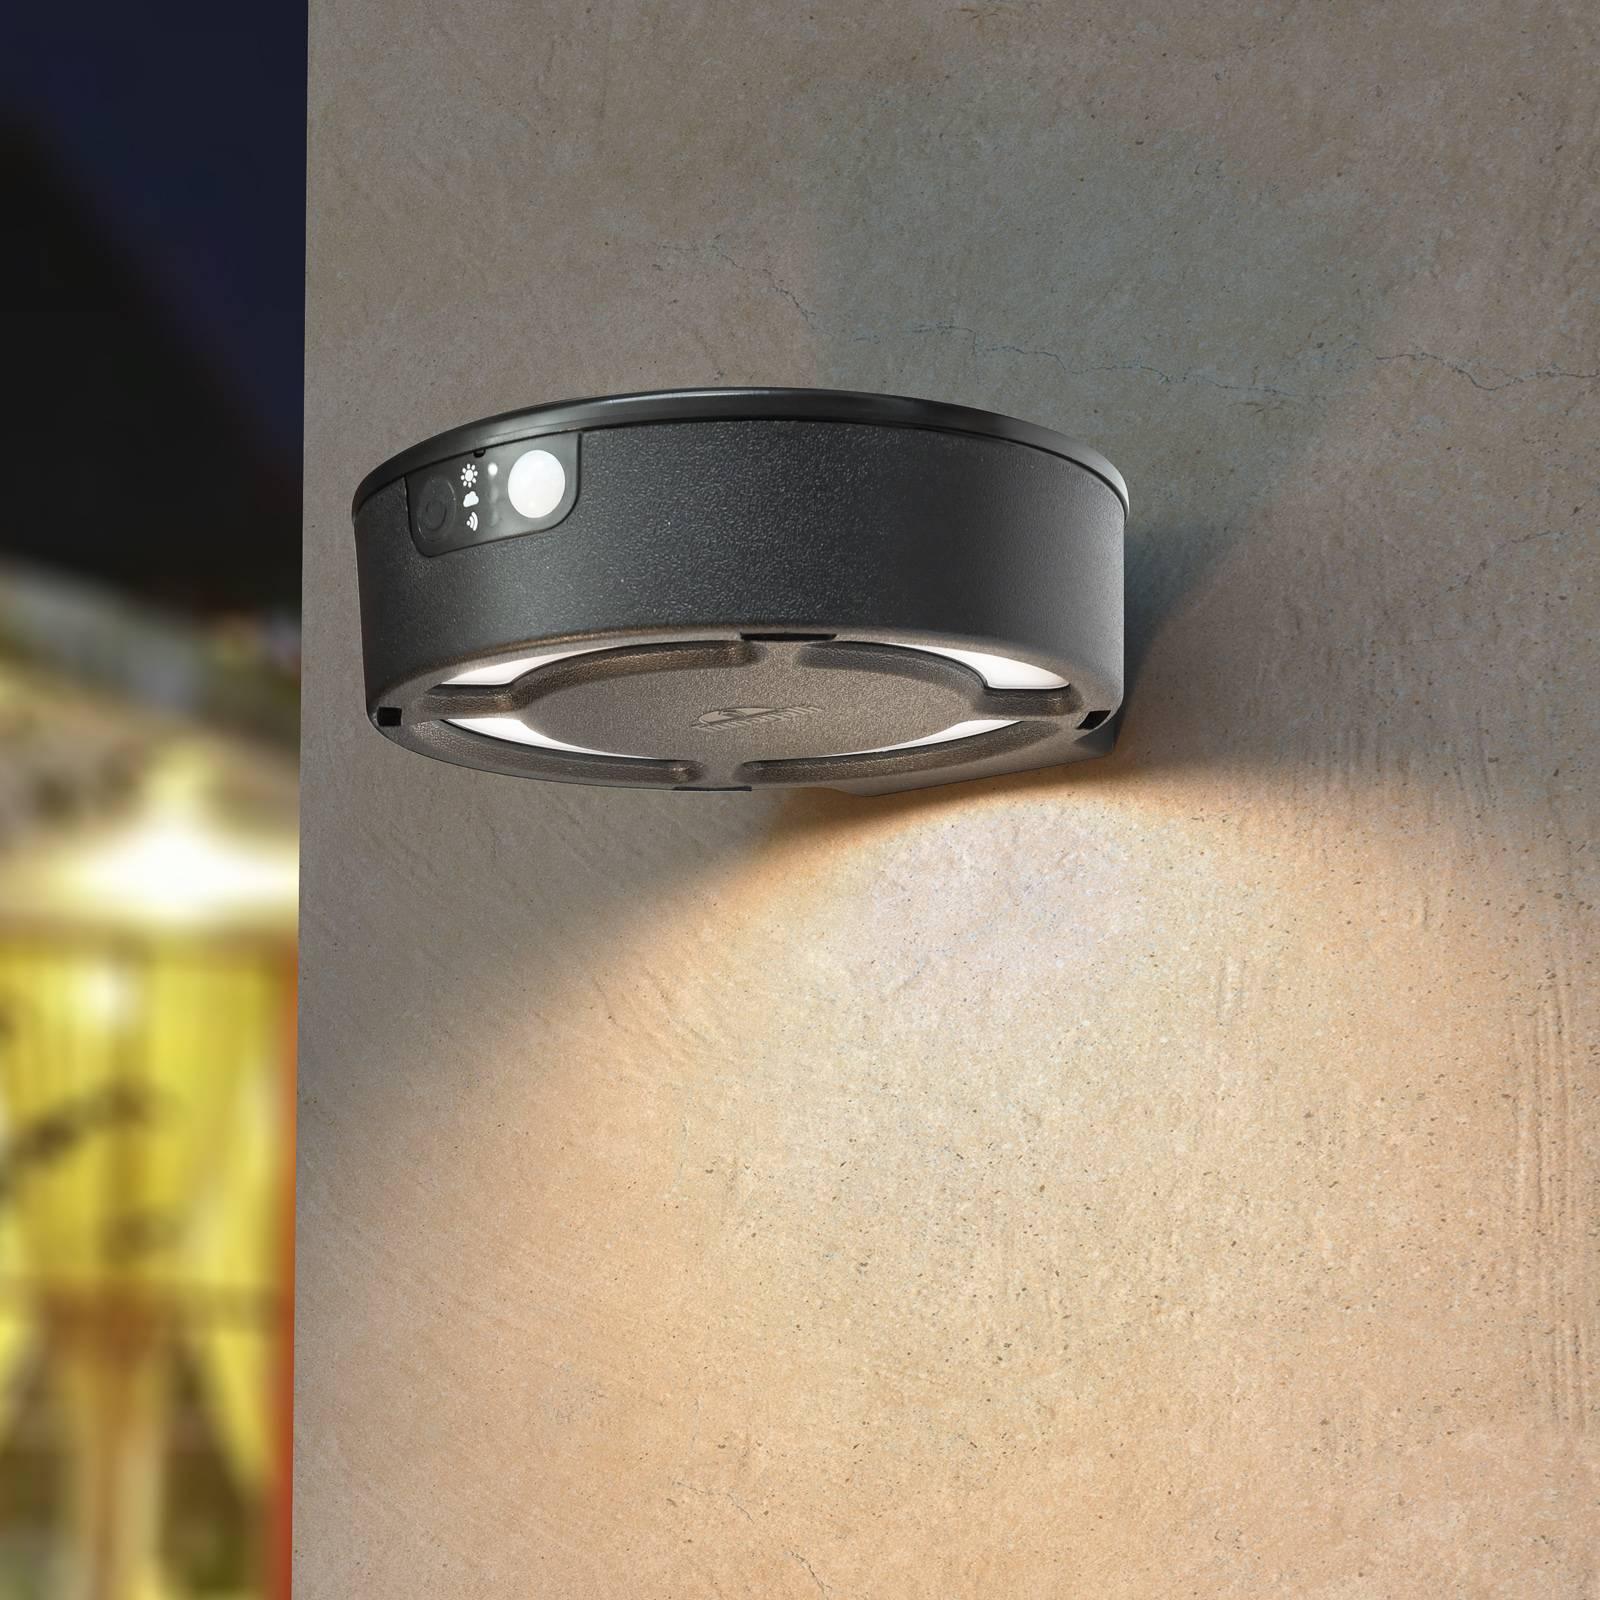 LED-aurinkoseinälamppu Fortunato musta, CCT sensor